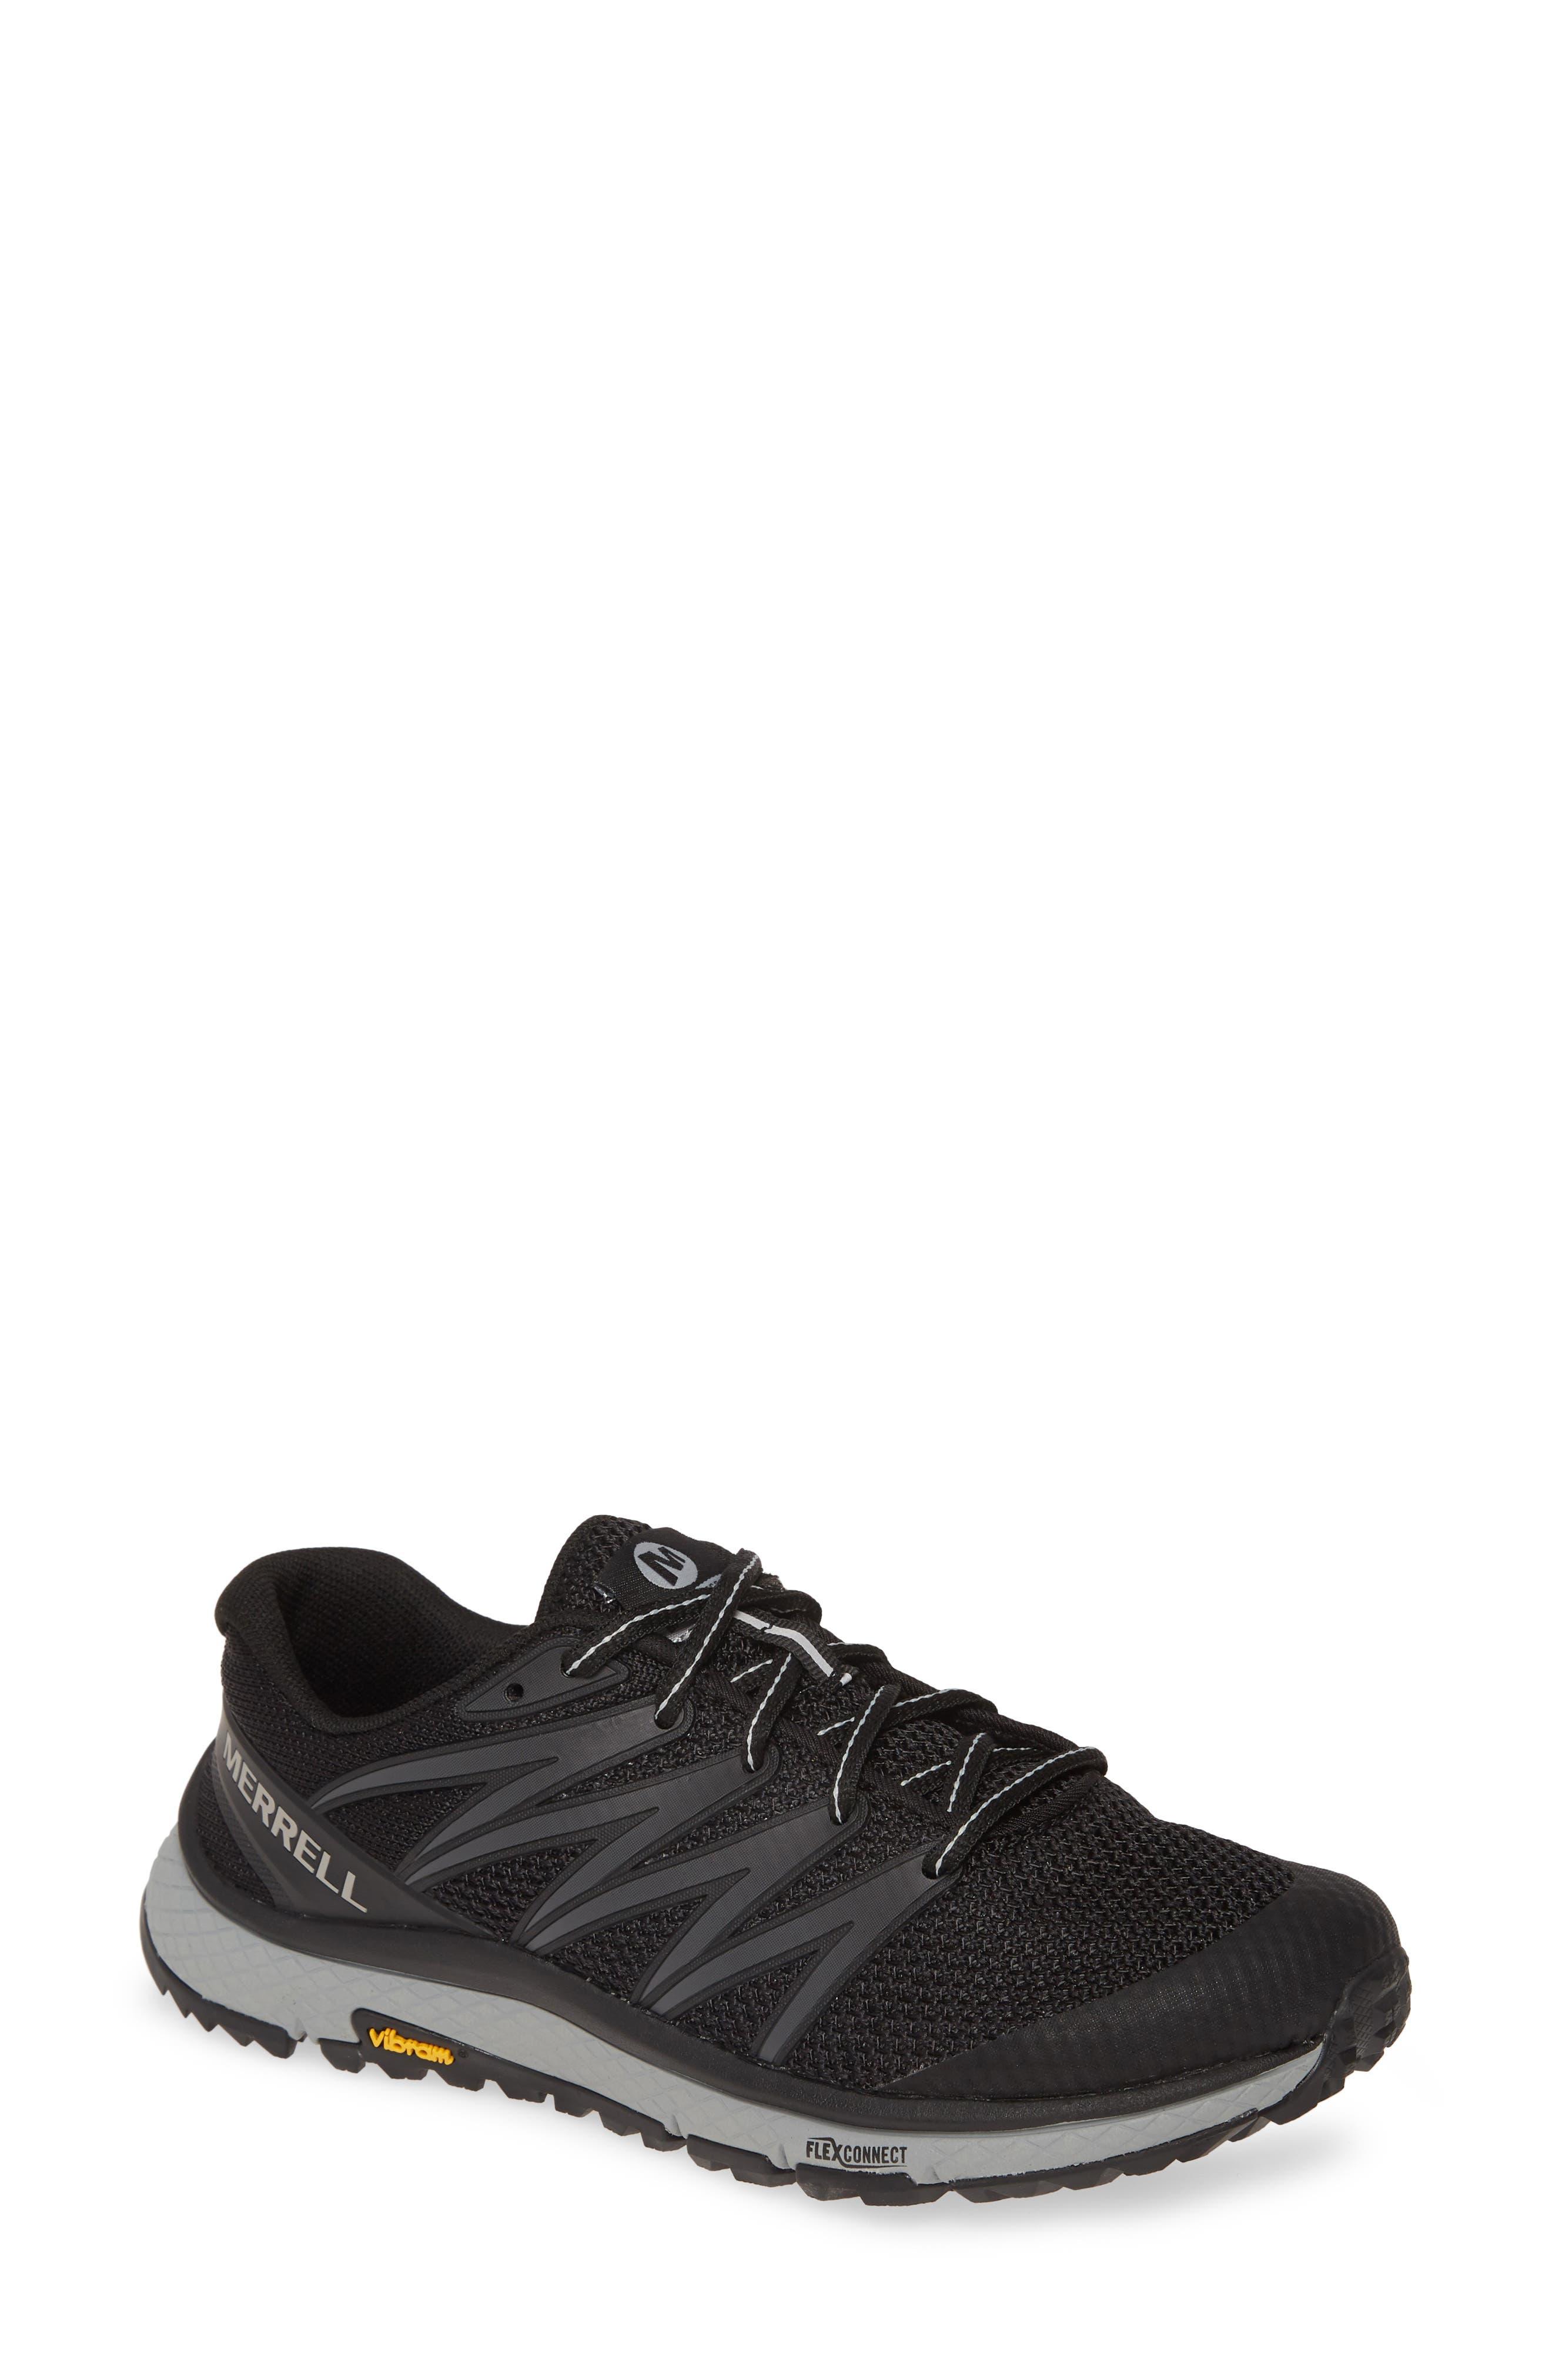 Women's Merrell Sneakers \u0026 Athletic